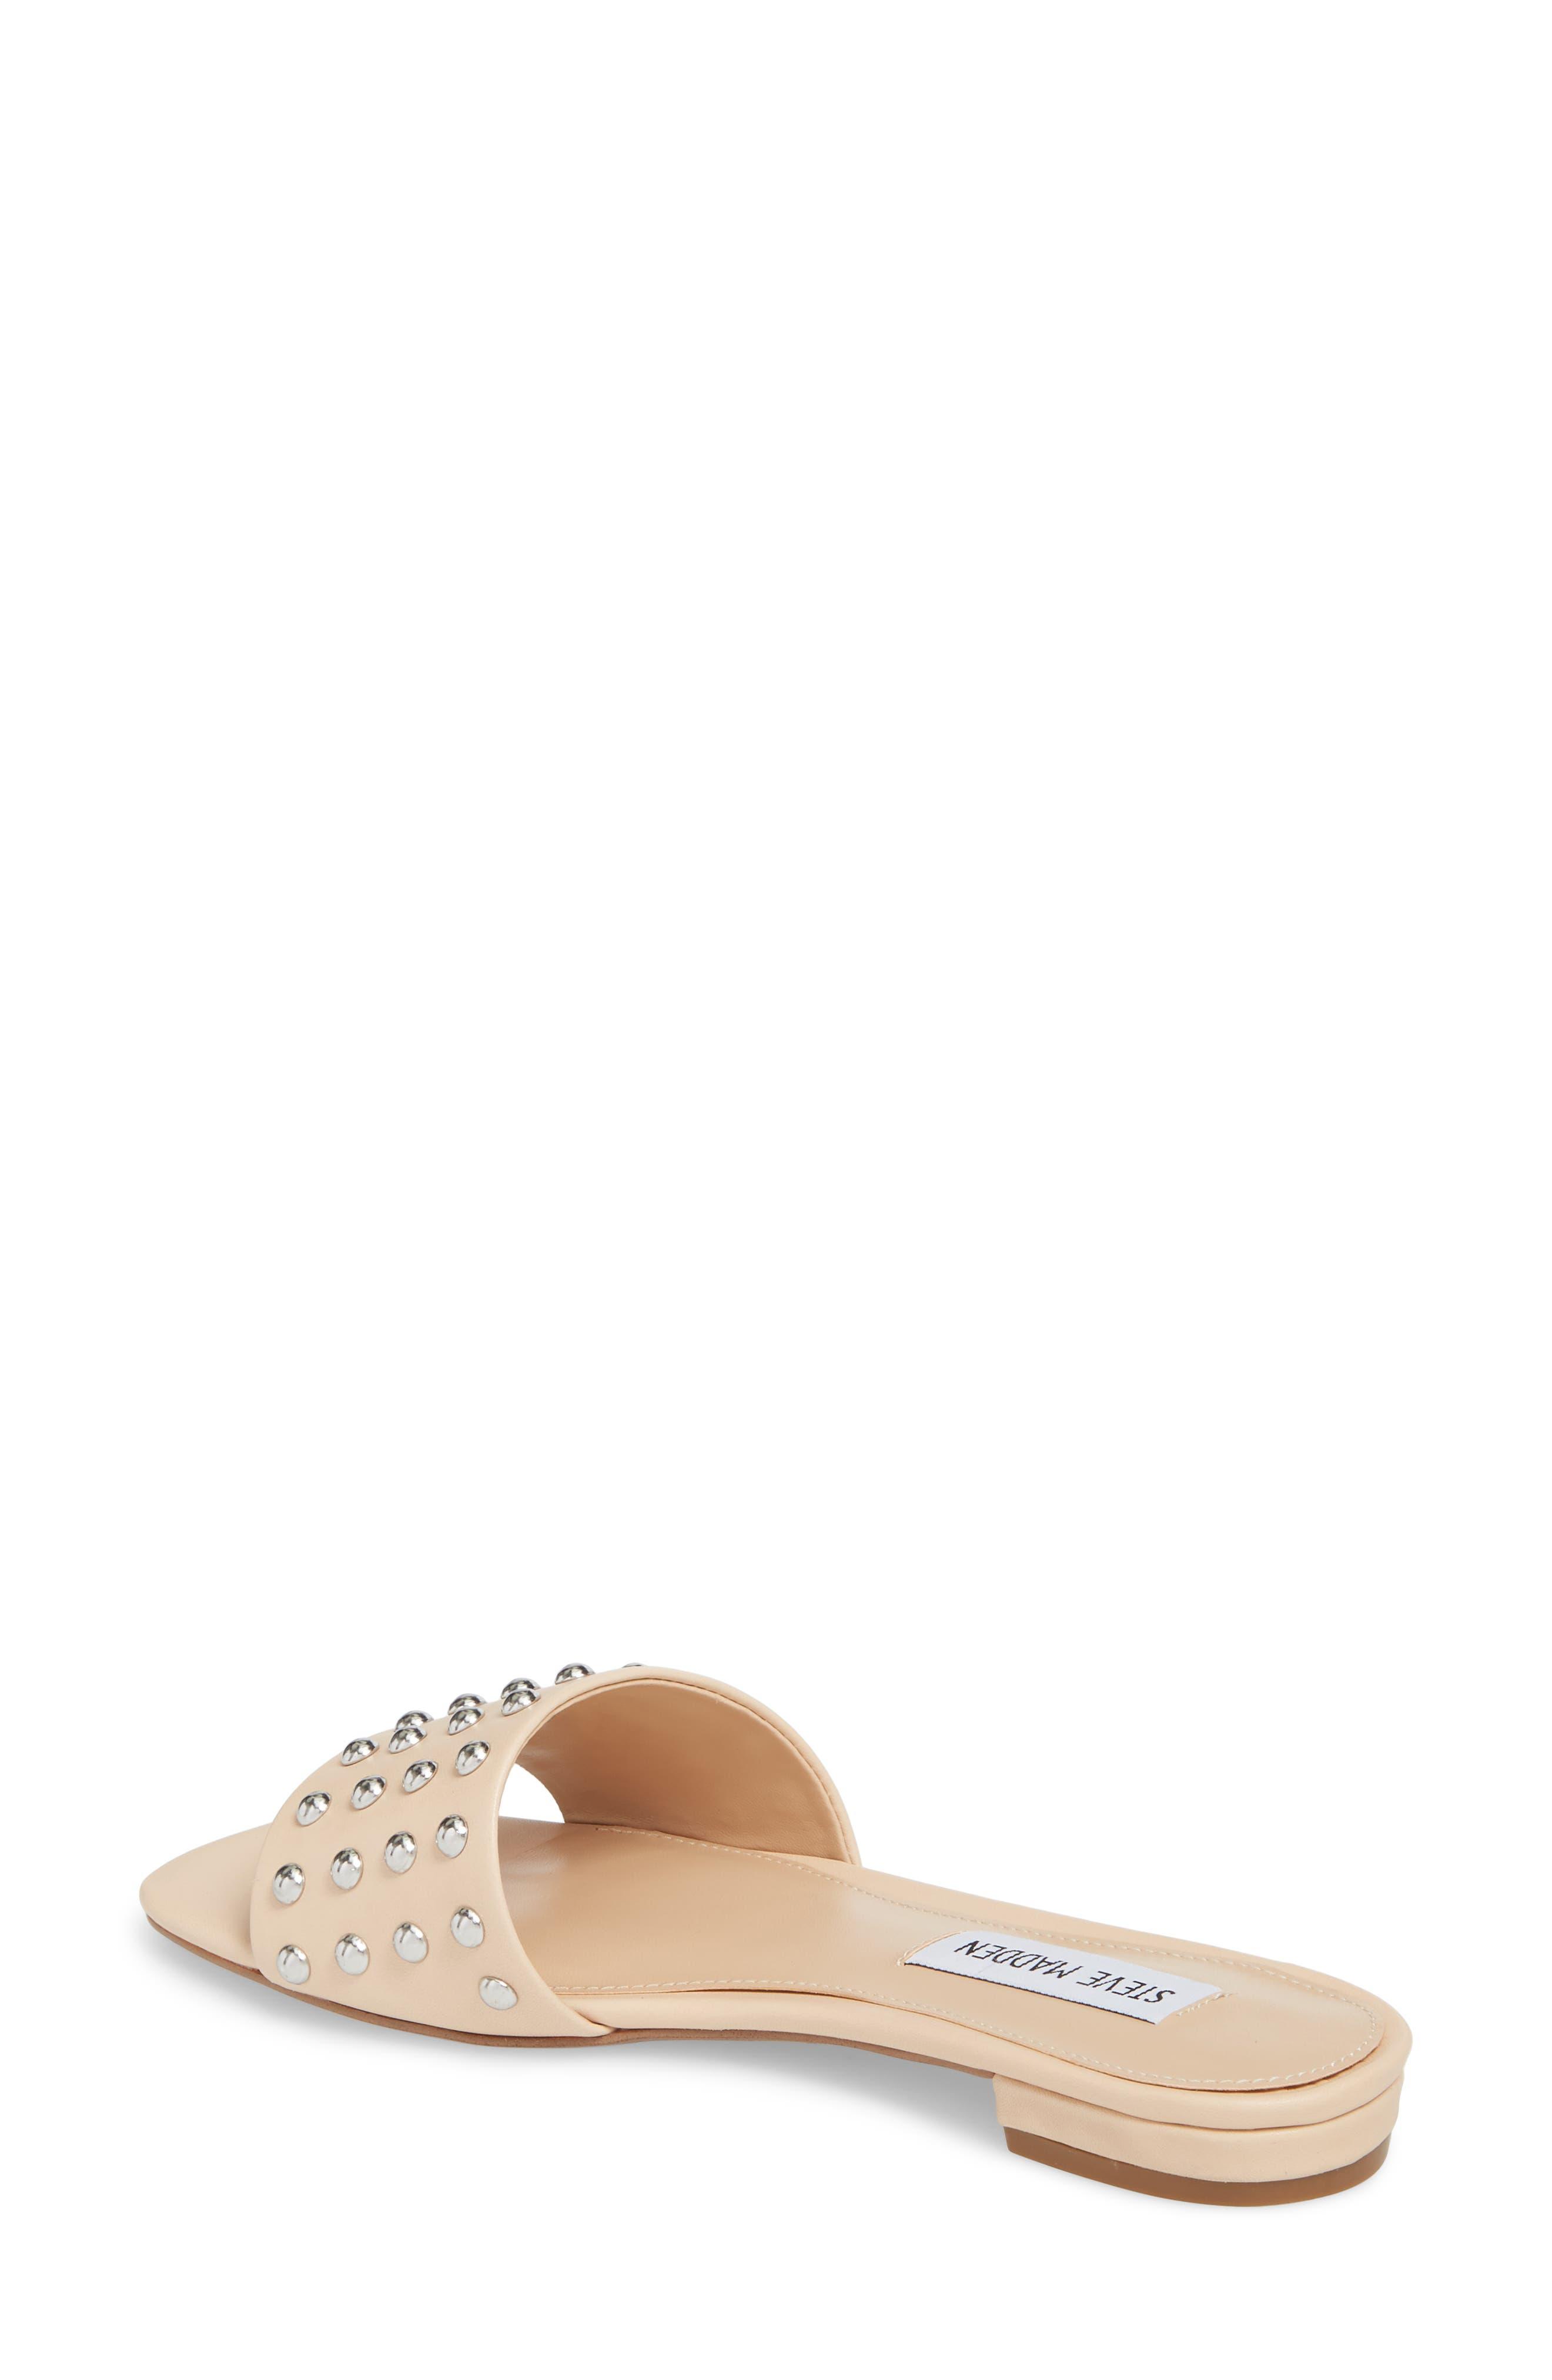 Viv Studded Slide Sandal,                             Alternate thumbnail 2, color,                             Blush Leather